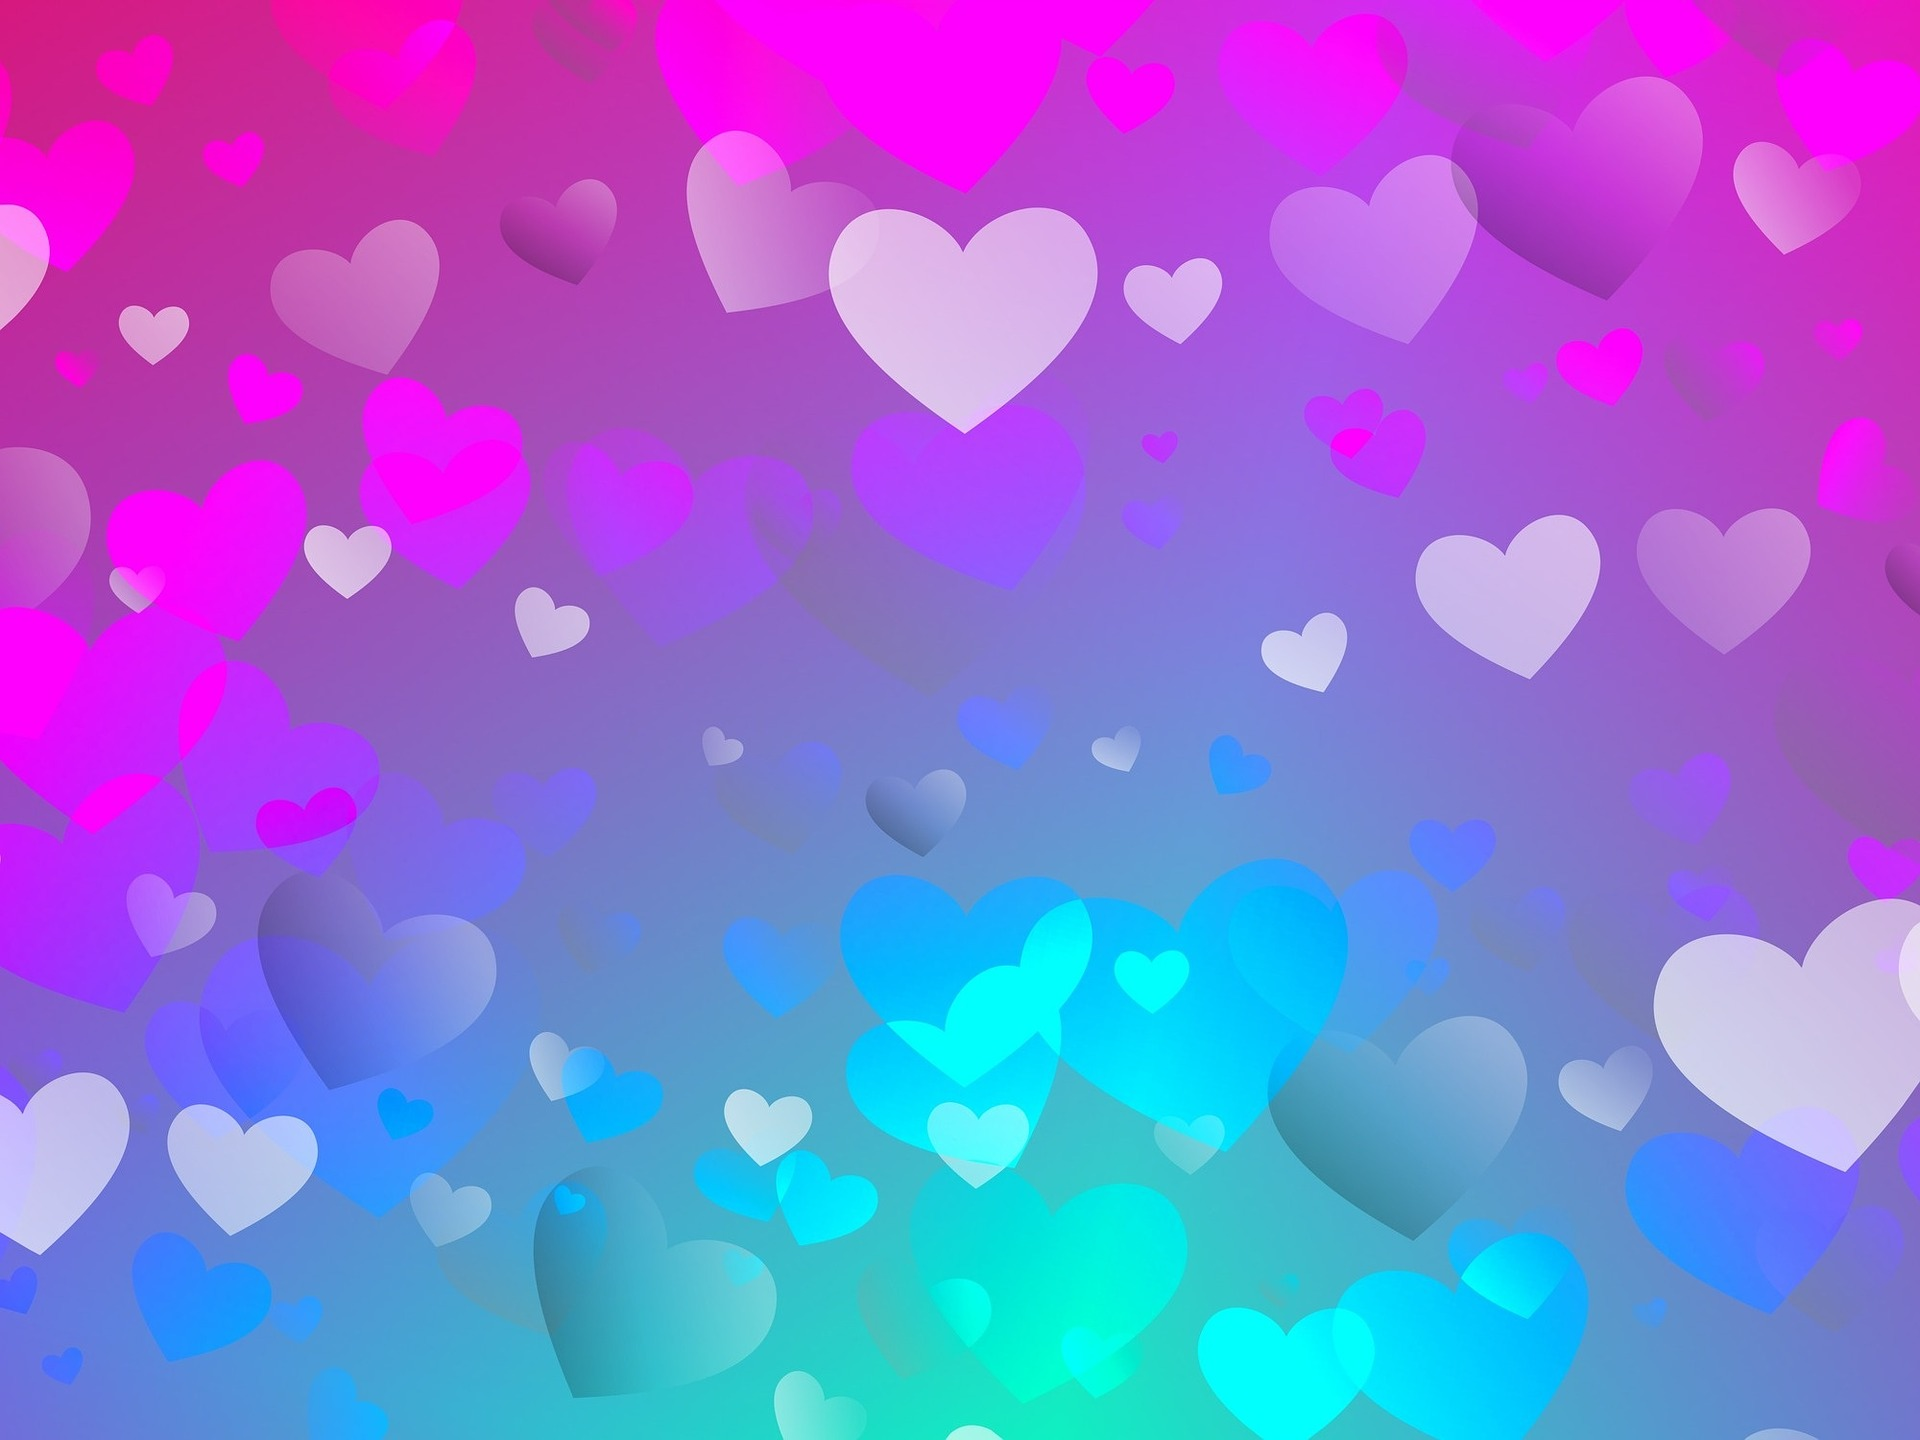 Flavie Dode énergie douce coeur amour rose bleu violet